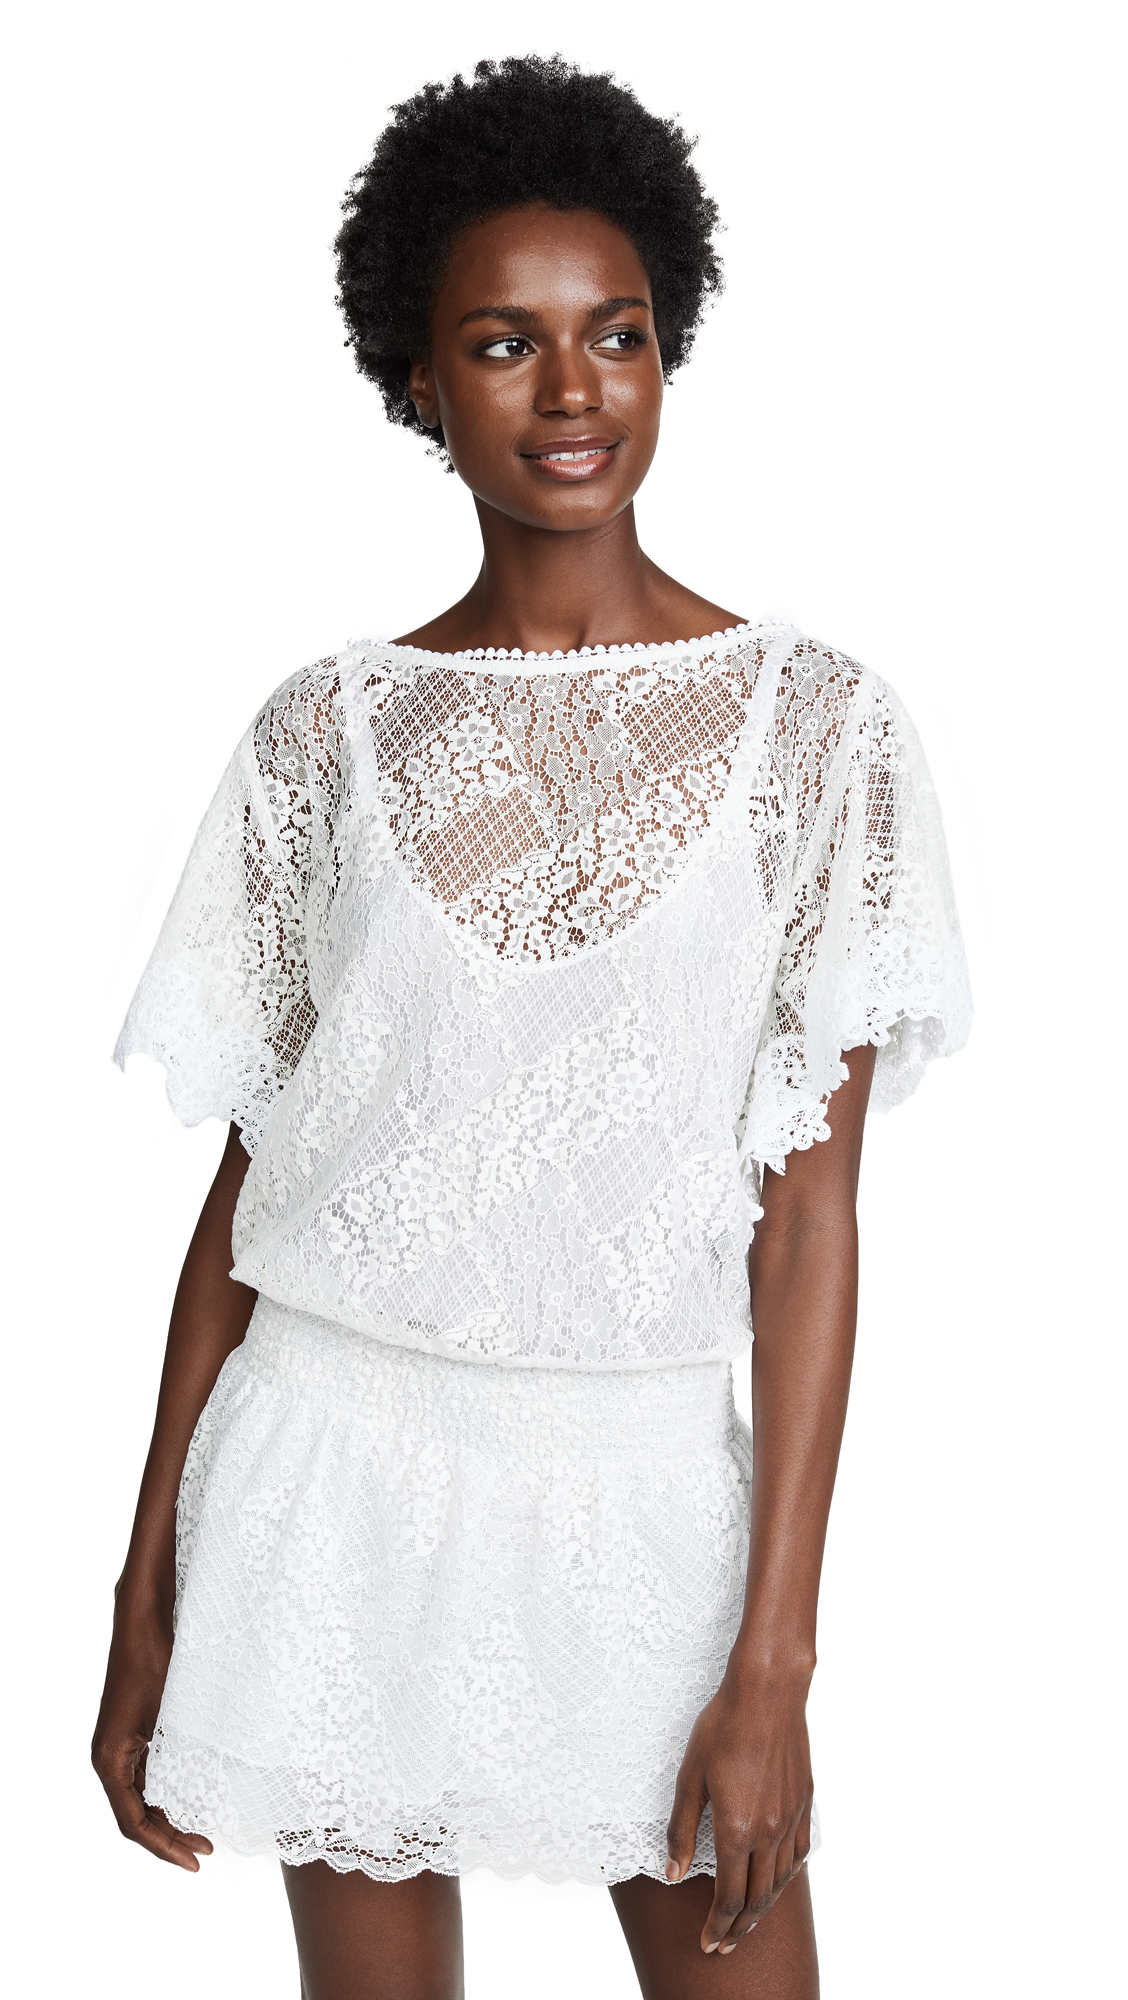 Temptation Positano Bristol Drop Waist Short Sleeve Dress In White